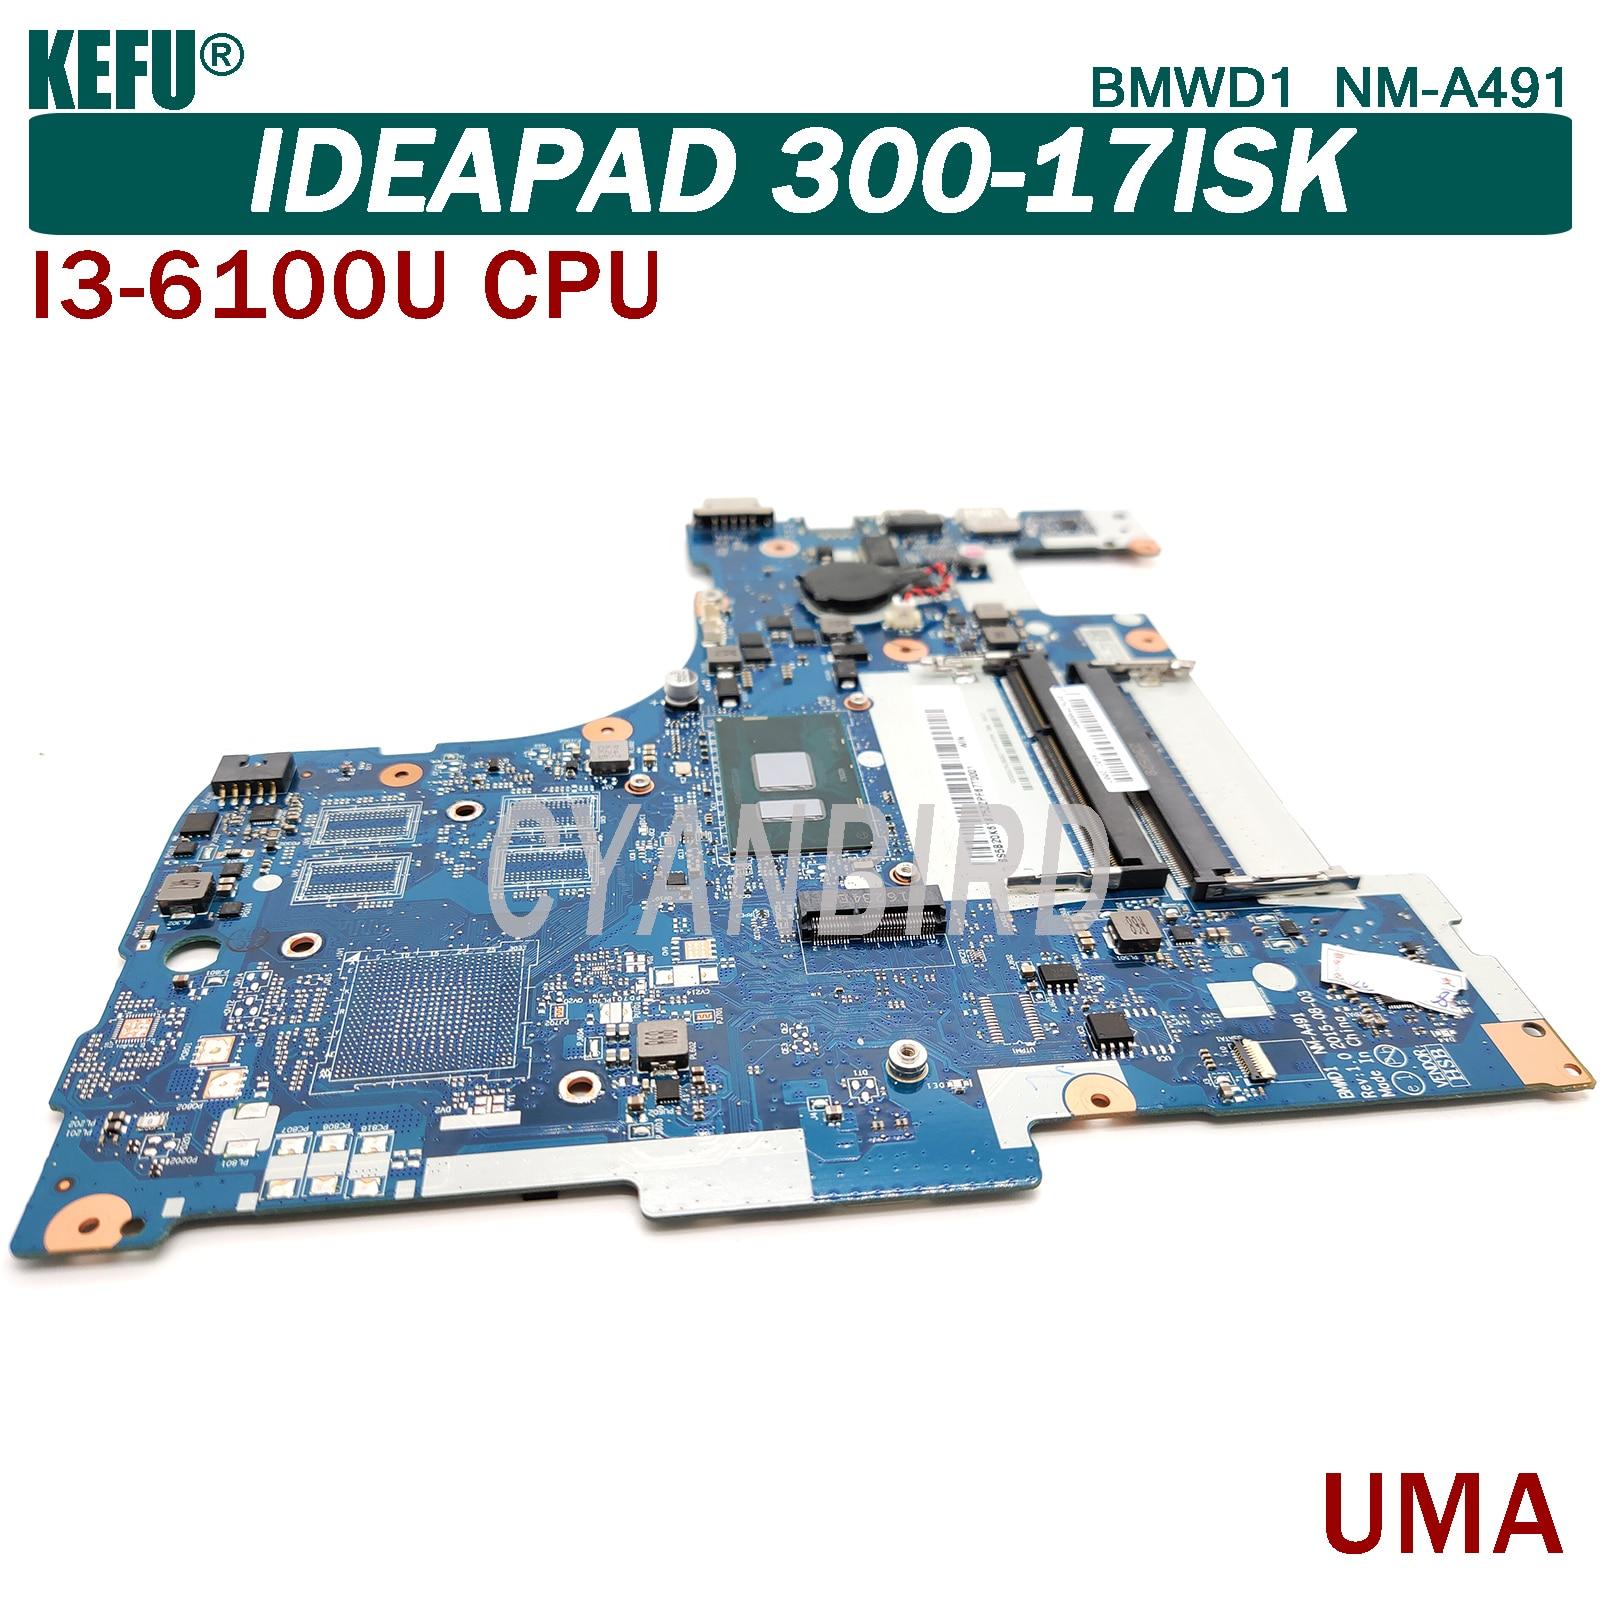 KEFU BMWD1 NM-A491 اللوحة الرئيسية الأصلية لينوفو IdeaPad 300-17ISK UMA مع DDR3L I3-6100U اللوحة الأم للكمبيوتر المحمول